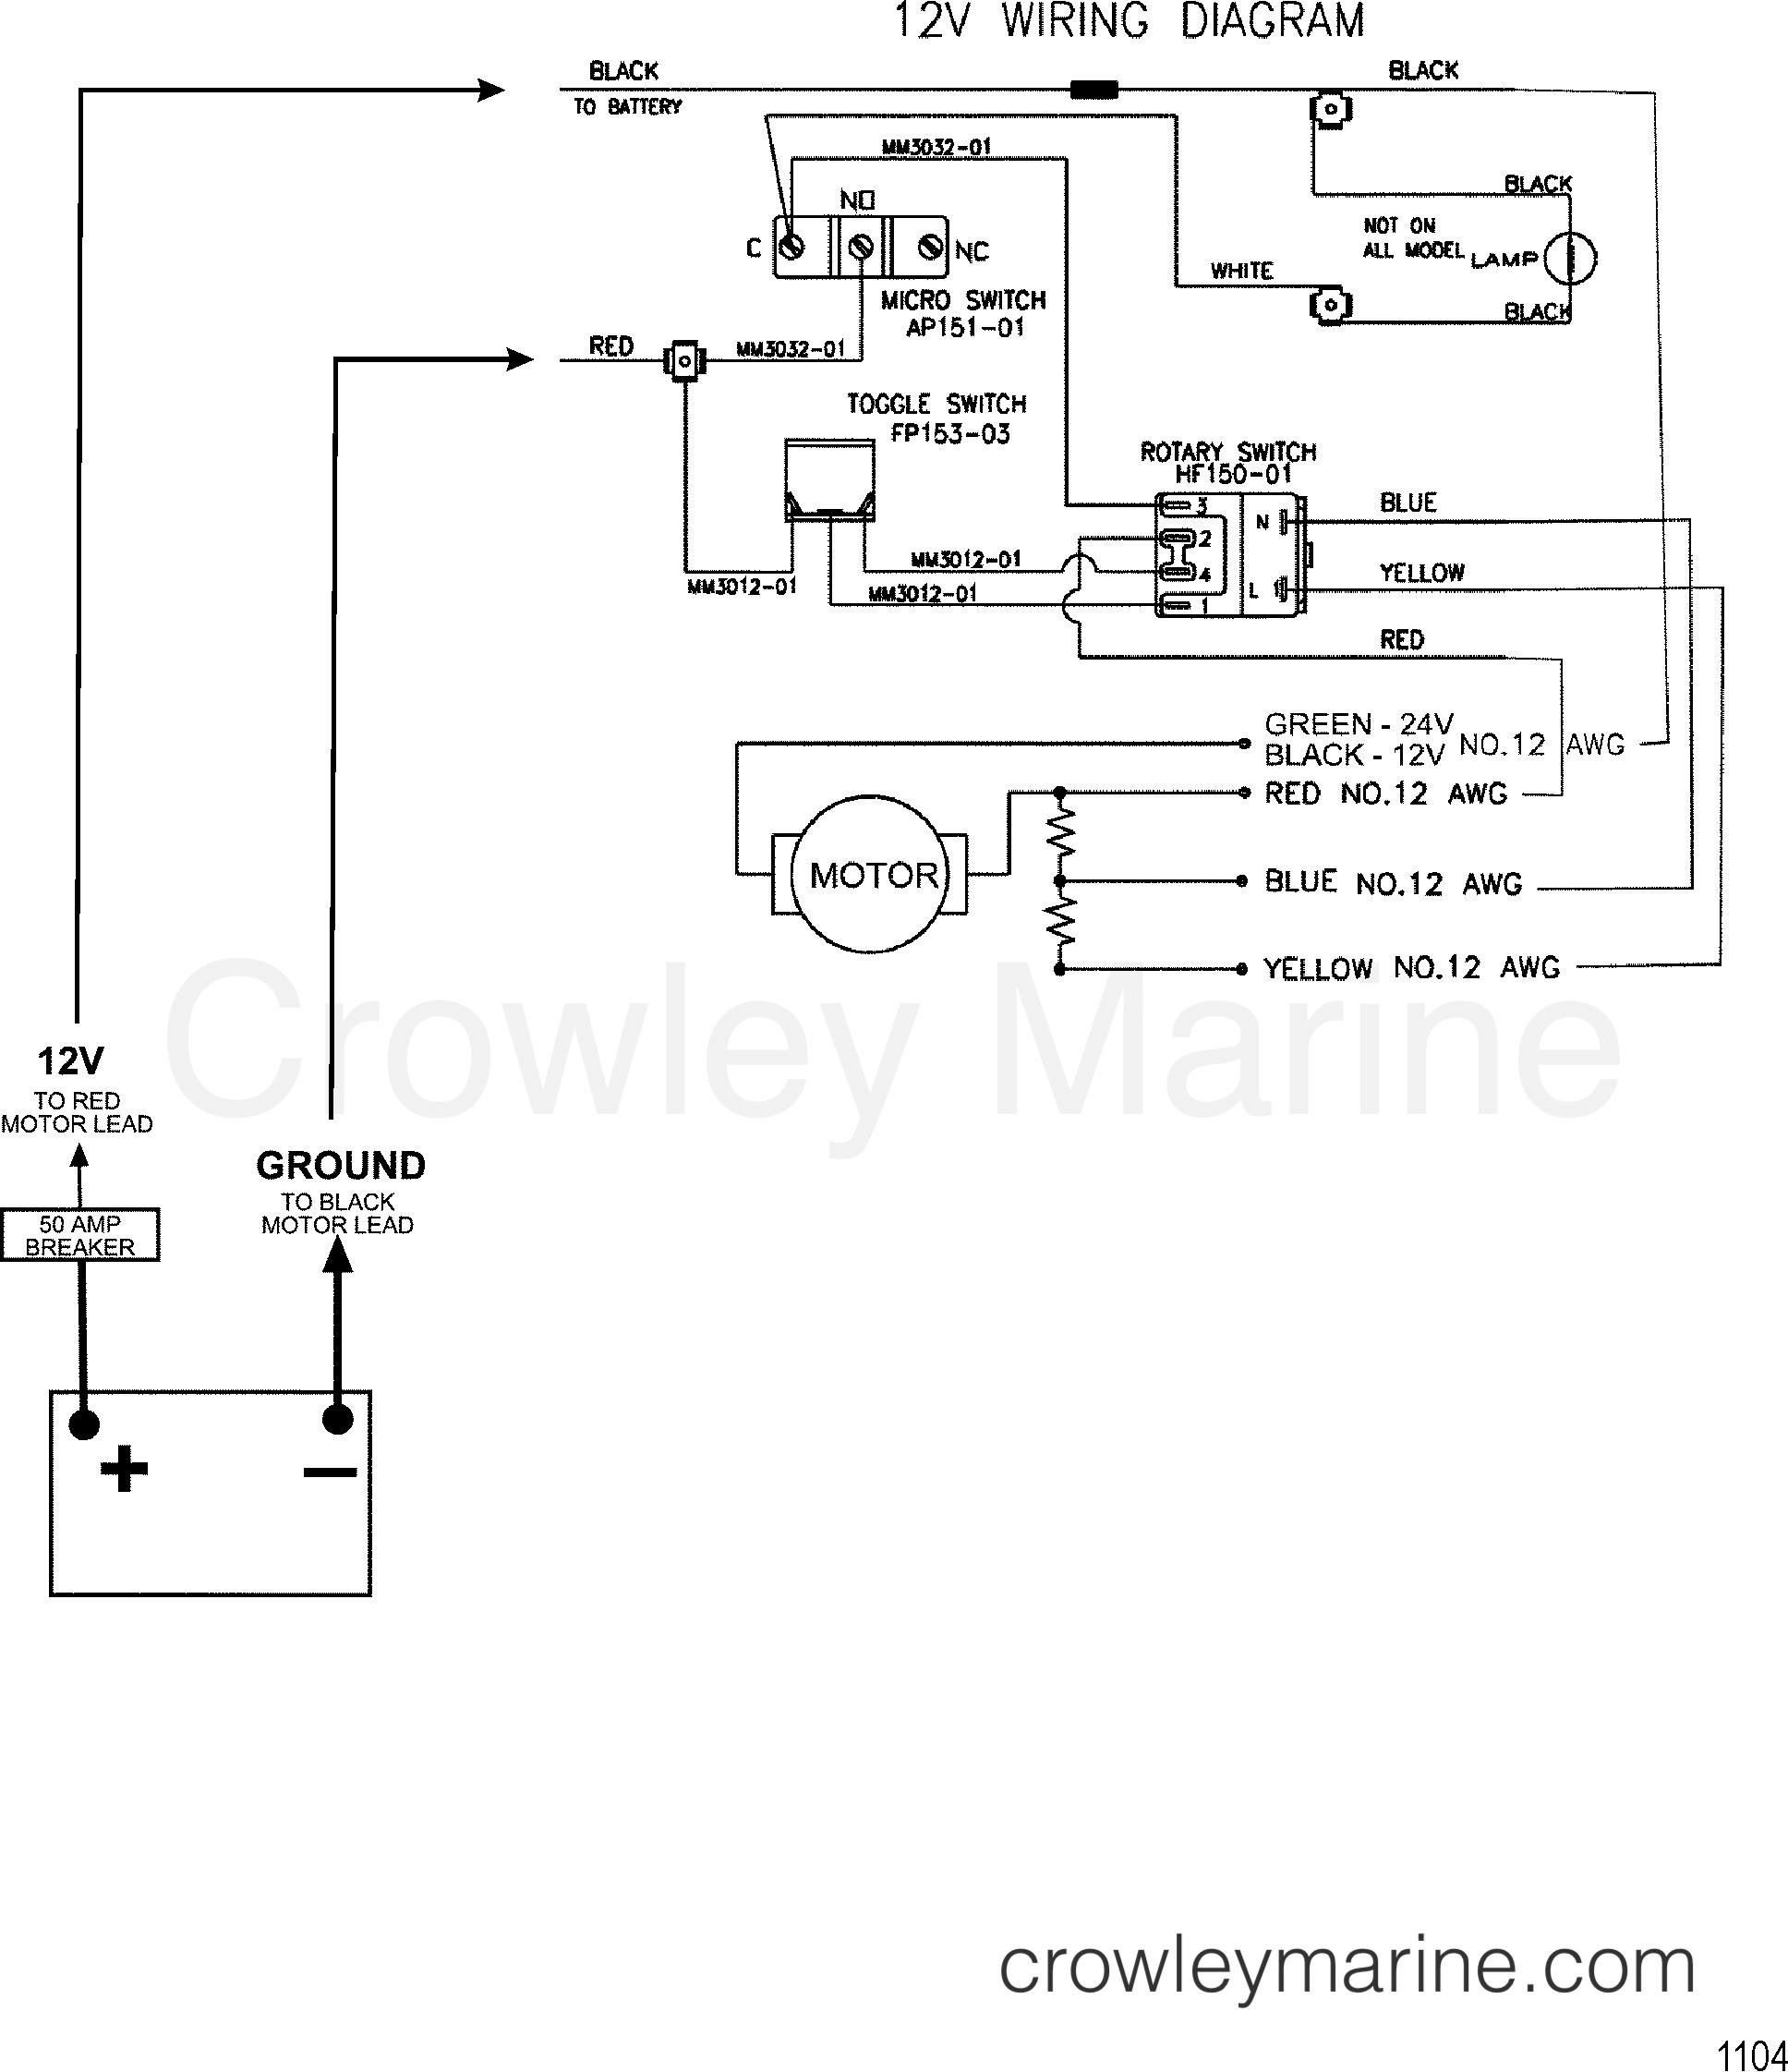 motorguide trolling motor wiring diagram motorguide motorguide 12 volt wiring diagram wiring get image about on motorguide trolling motor wiring diagram